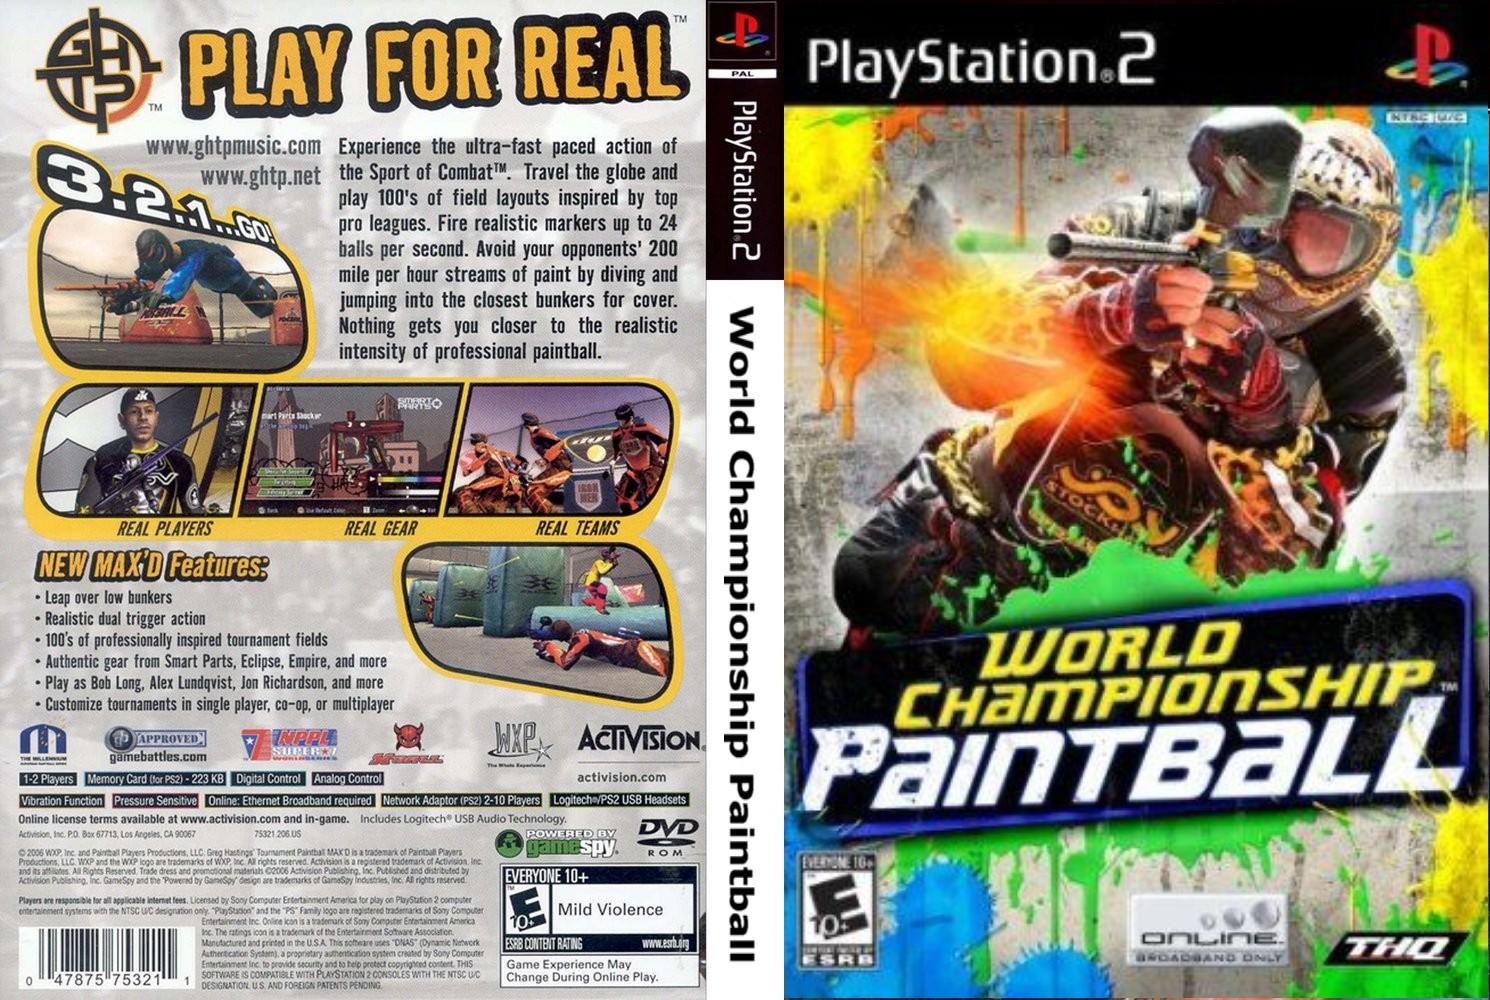 WorldChampionshipPaintball